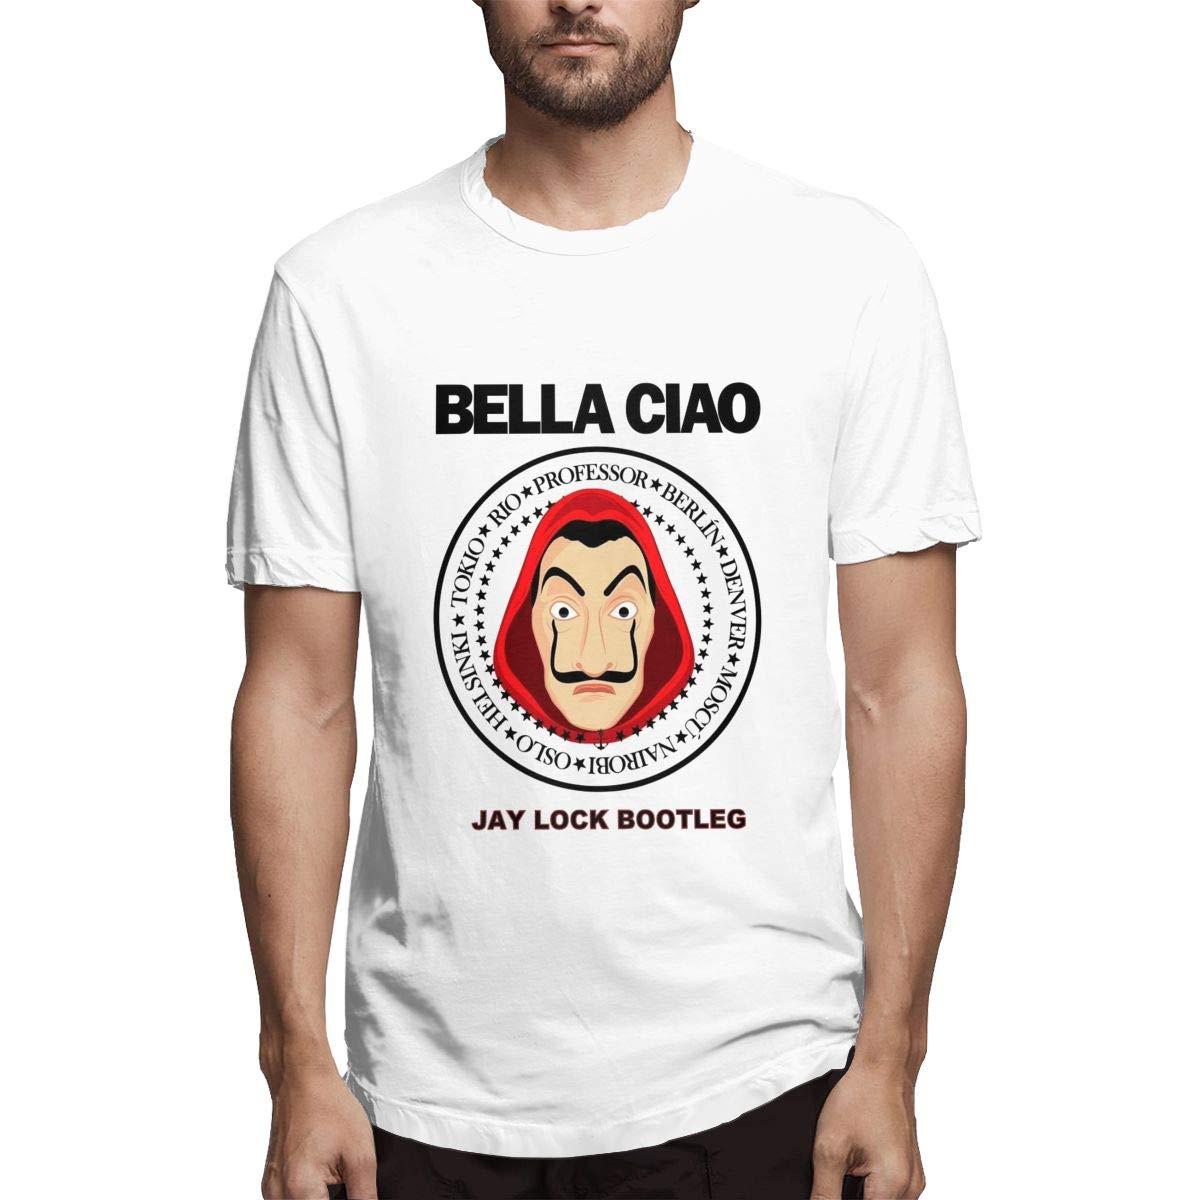 QINSHAONI Bella CIAO Teenagers Boy Retro Fashion Printed Letters Cartoon Pattern Comfortable Light T-Shirt T-Shirts 3XL